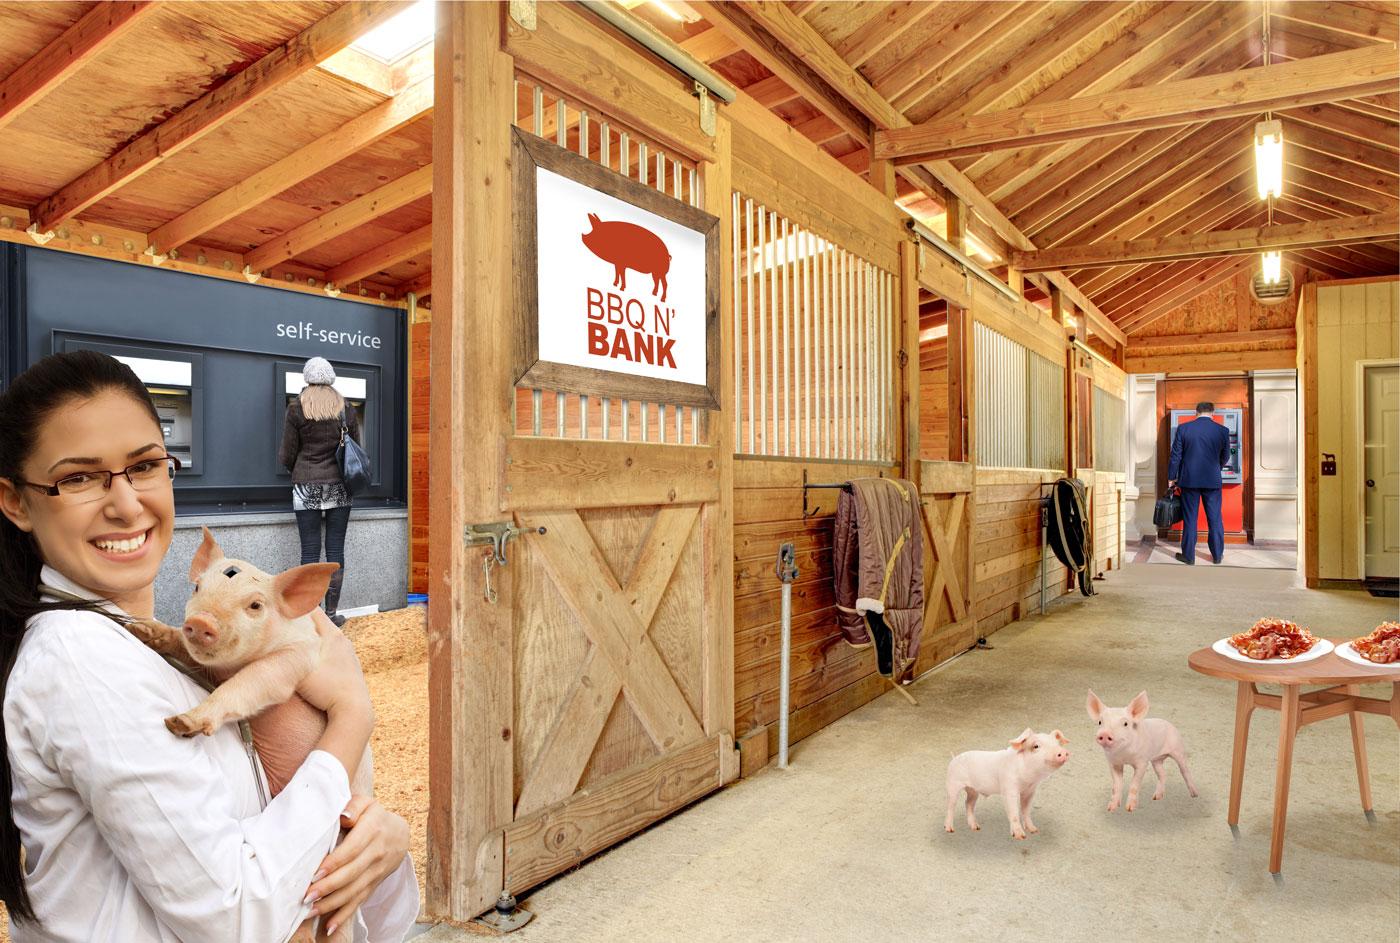 Bacon-Bank-medium.jpg